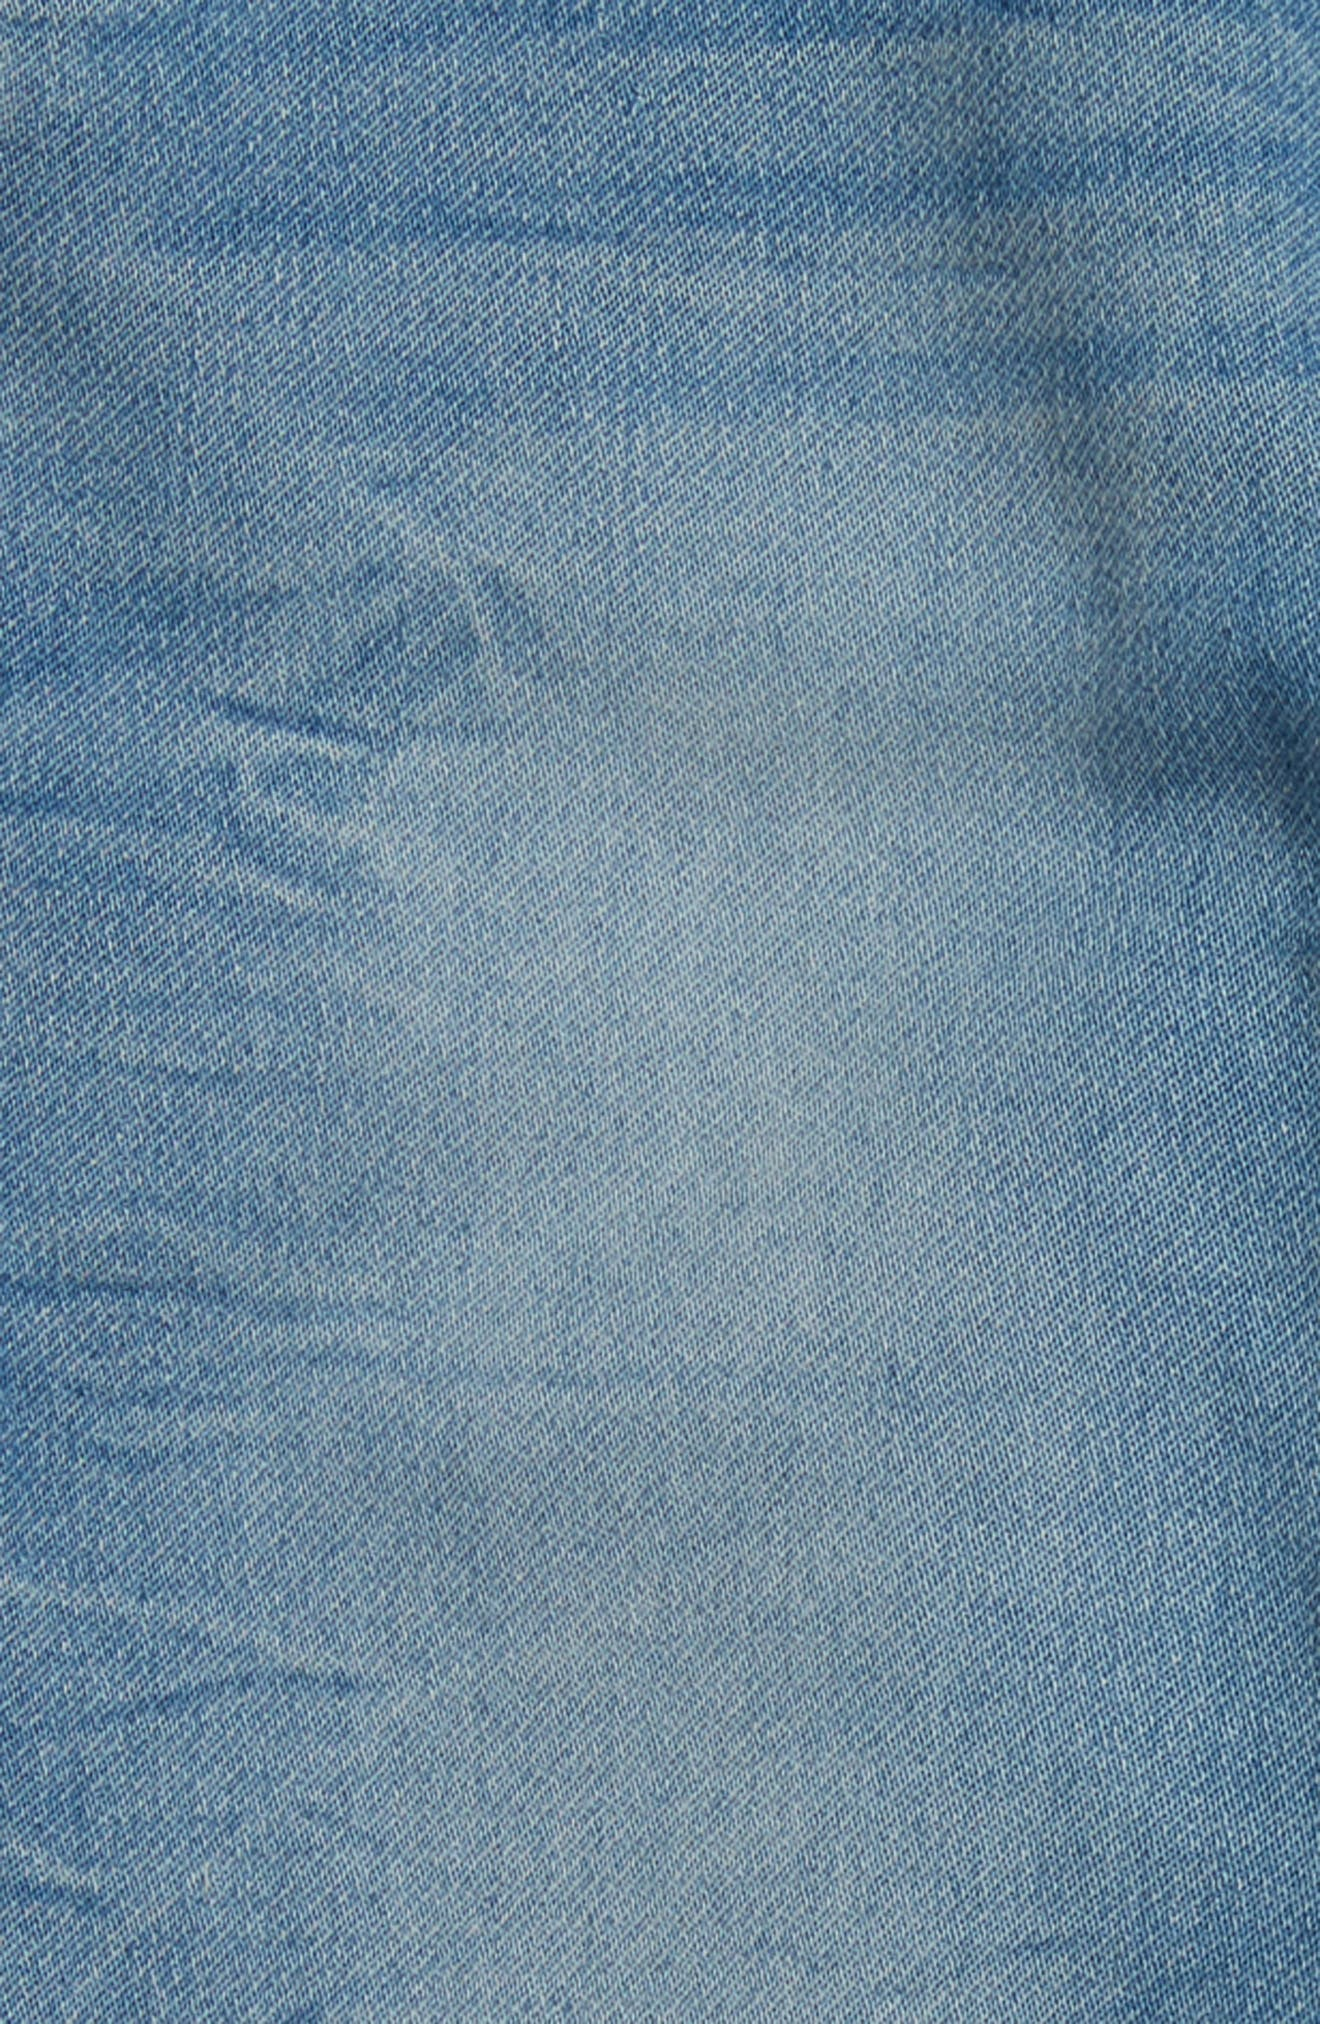 Denim Sweatpants,                             Alternate thumbnail 4, color,                             Electric Wash